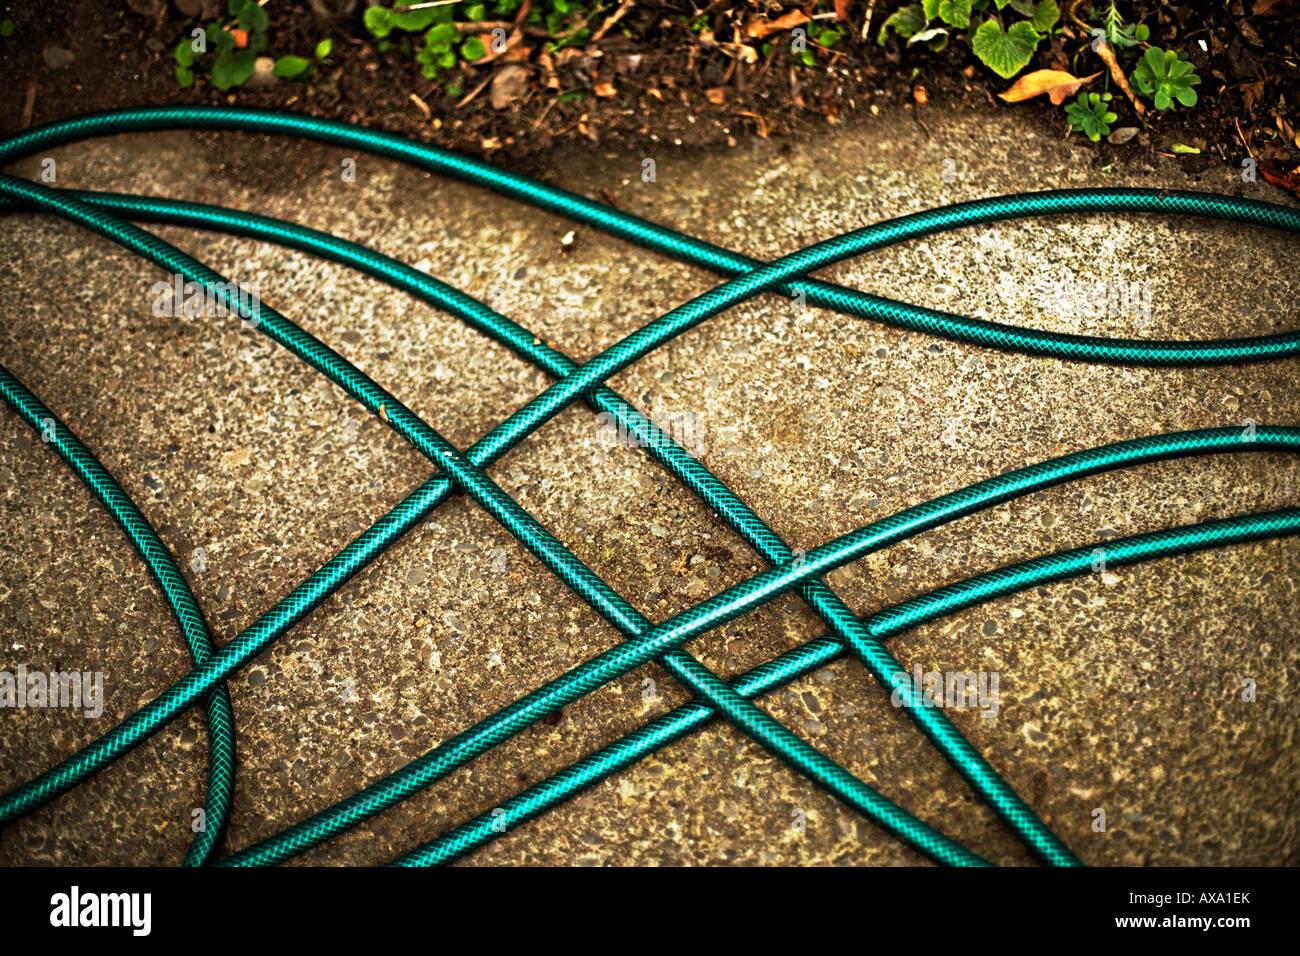 Manguera de jardín en hormigón ruta Imagen De Stock